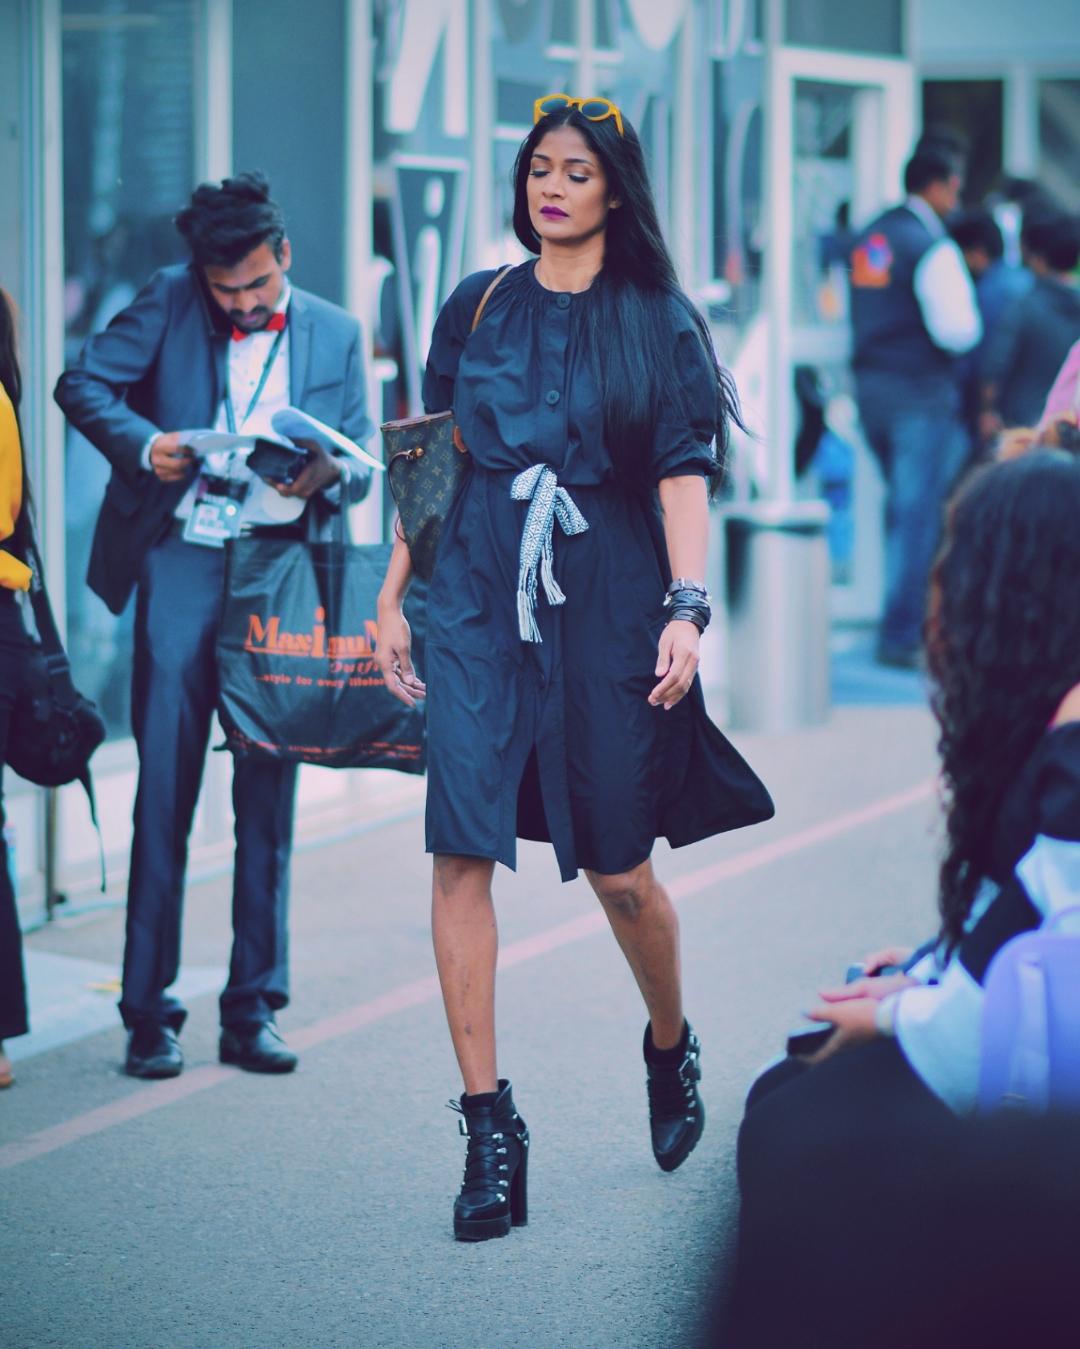 Naina.co, Naina, Naina Redhu, AIFWAW18, Amazon India Fashion Week, Autumn Winter, Fashion Week, India Fashion Week, Delhi Fashion Week, FDCI, Street Style, EyesForStreetStyle, India Street Style, Street Style Photographer India, Lifestyle Photographer, Luxury Photographer, Lifestyle Blogger, Luxury Blogger, Lifestyle Influencer, Luxury Influencer India, Photo Blogger, Photo Influencer, Street Style Influencer, Street Style Blogger